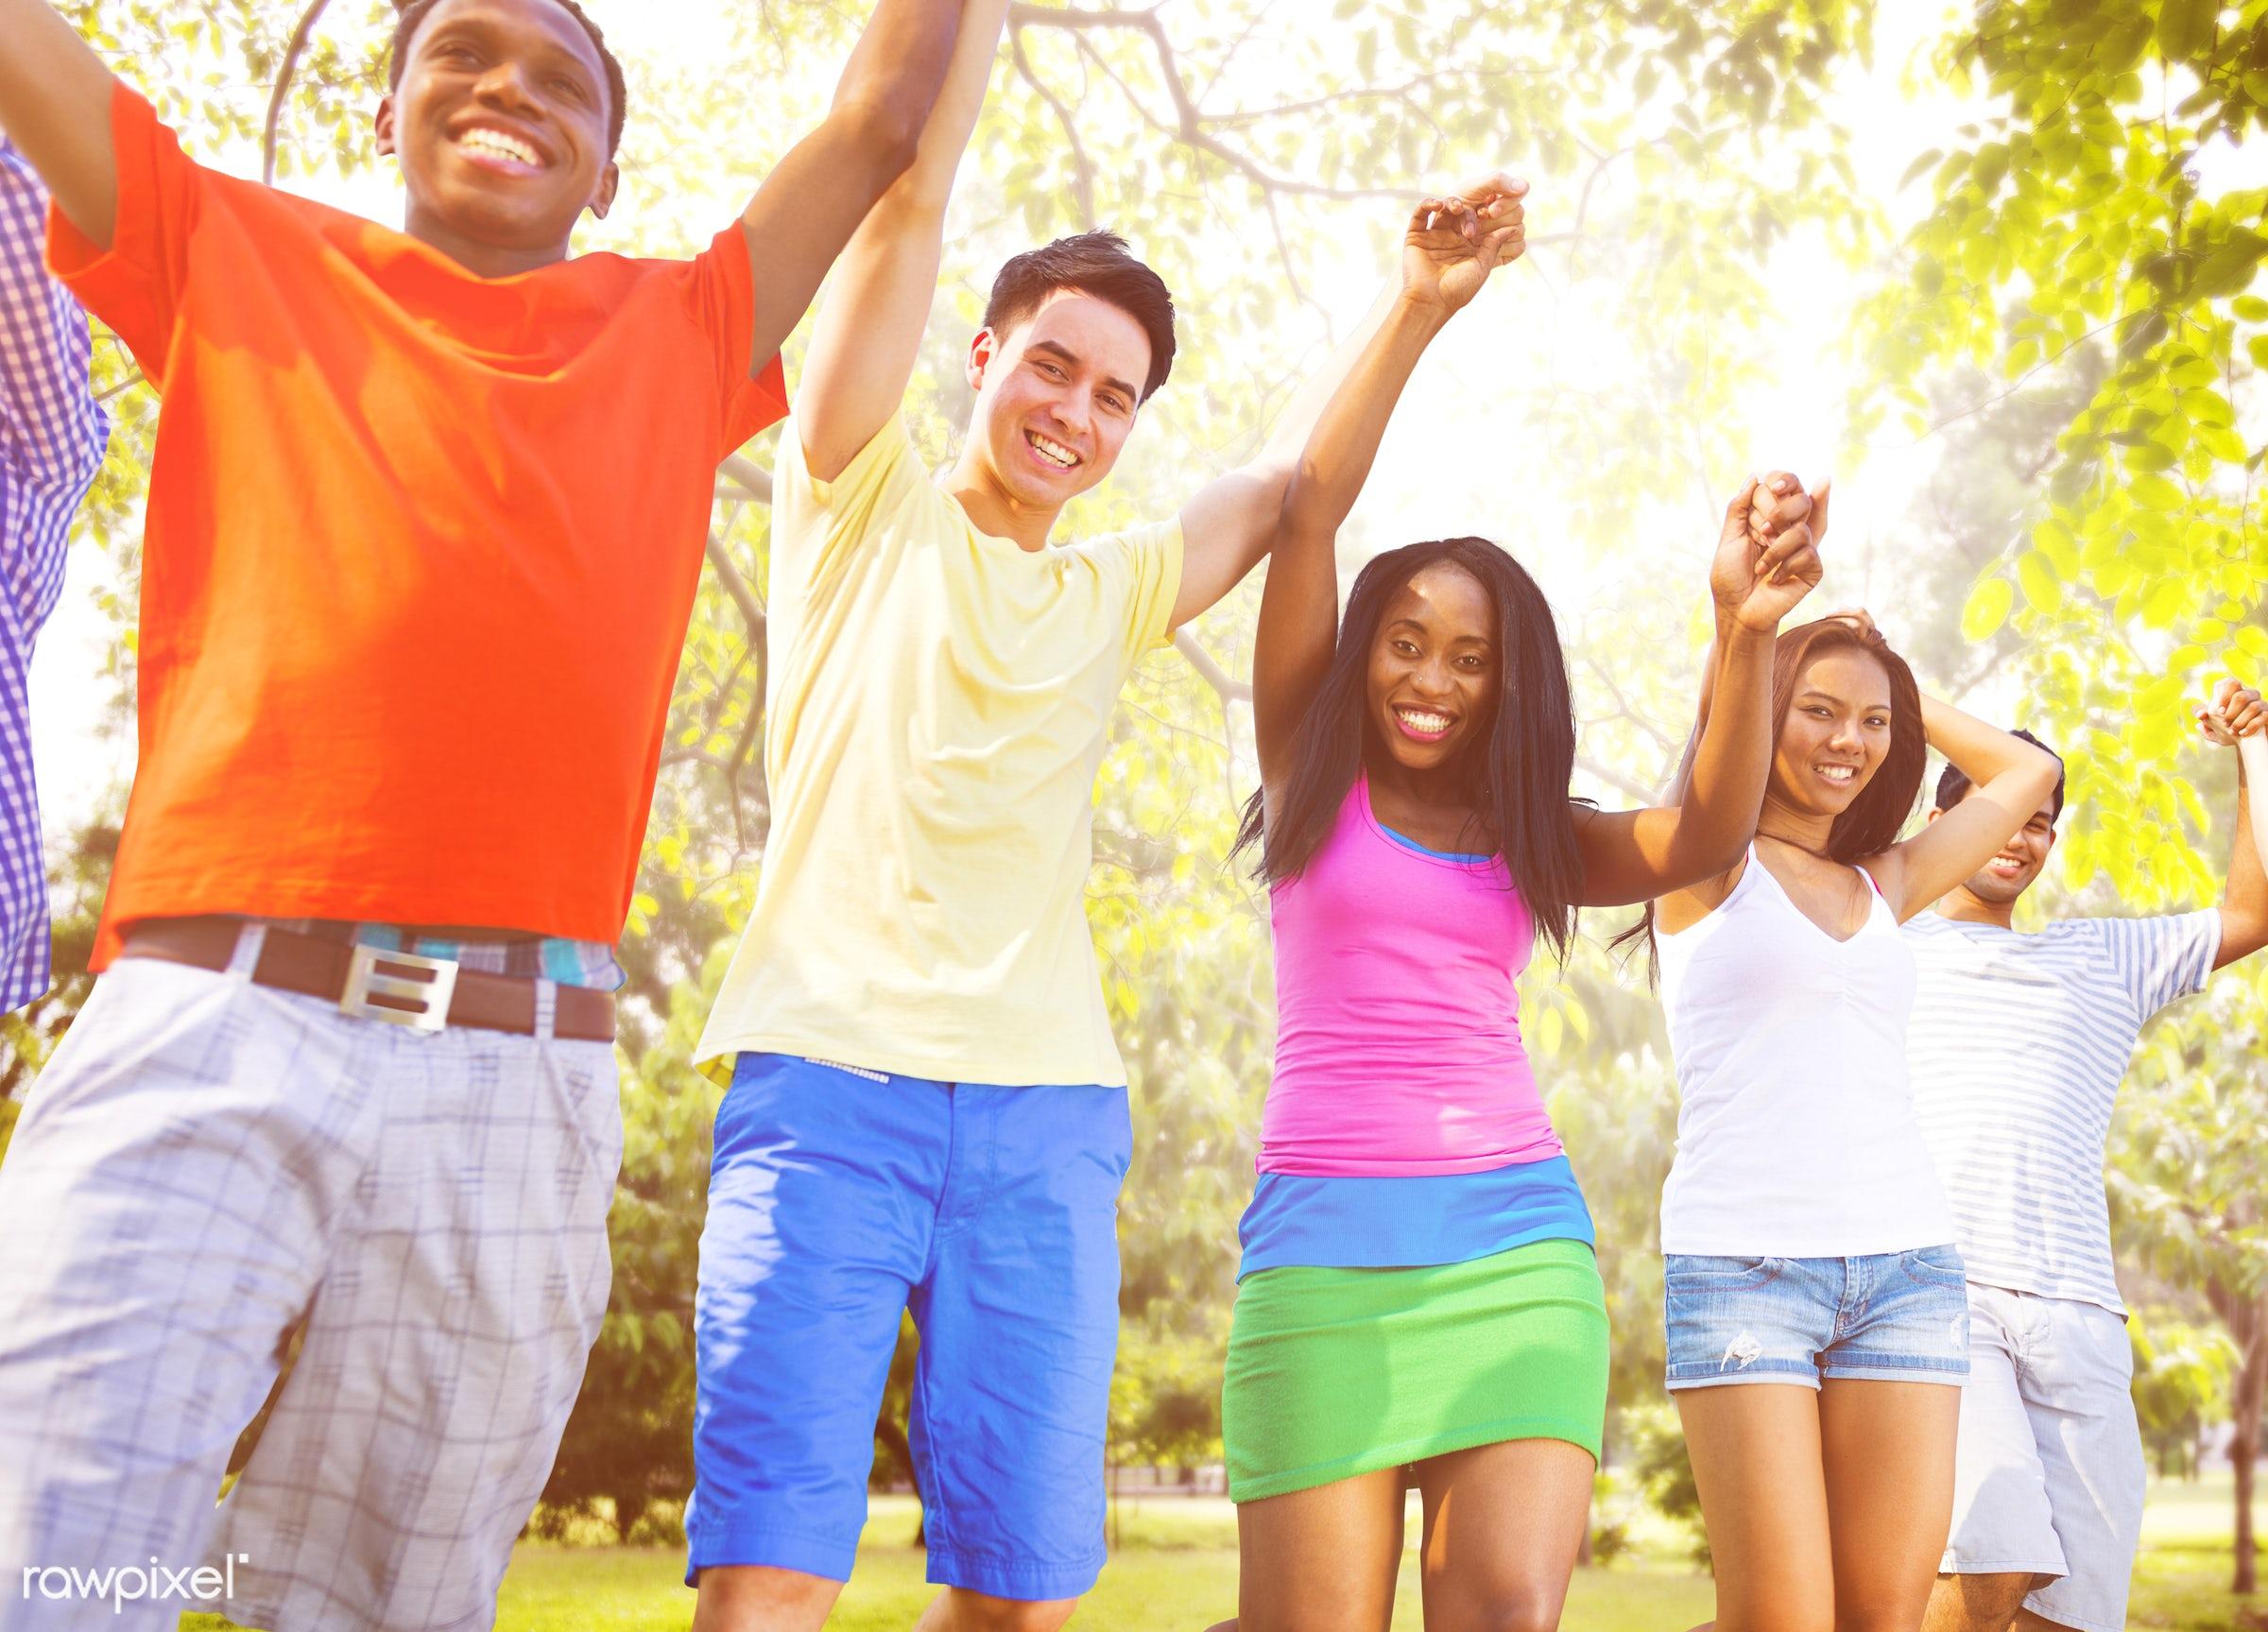 achievement, arms raised, celebration, cheerful, communication, community, connection, field, freedom, friendship, fun,...